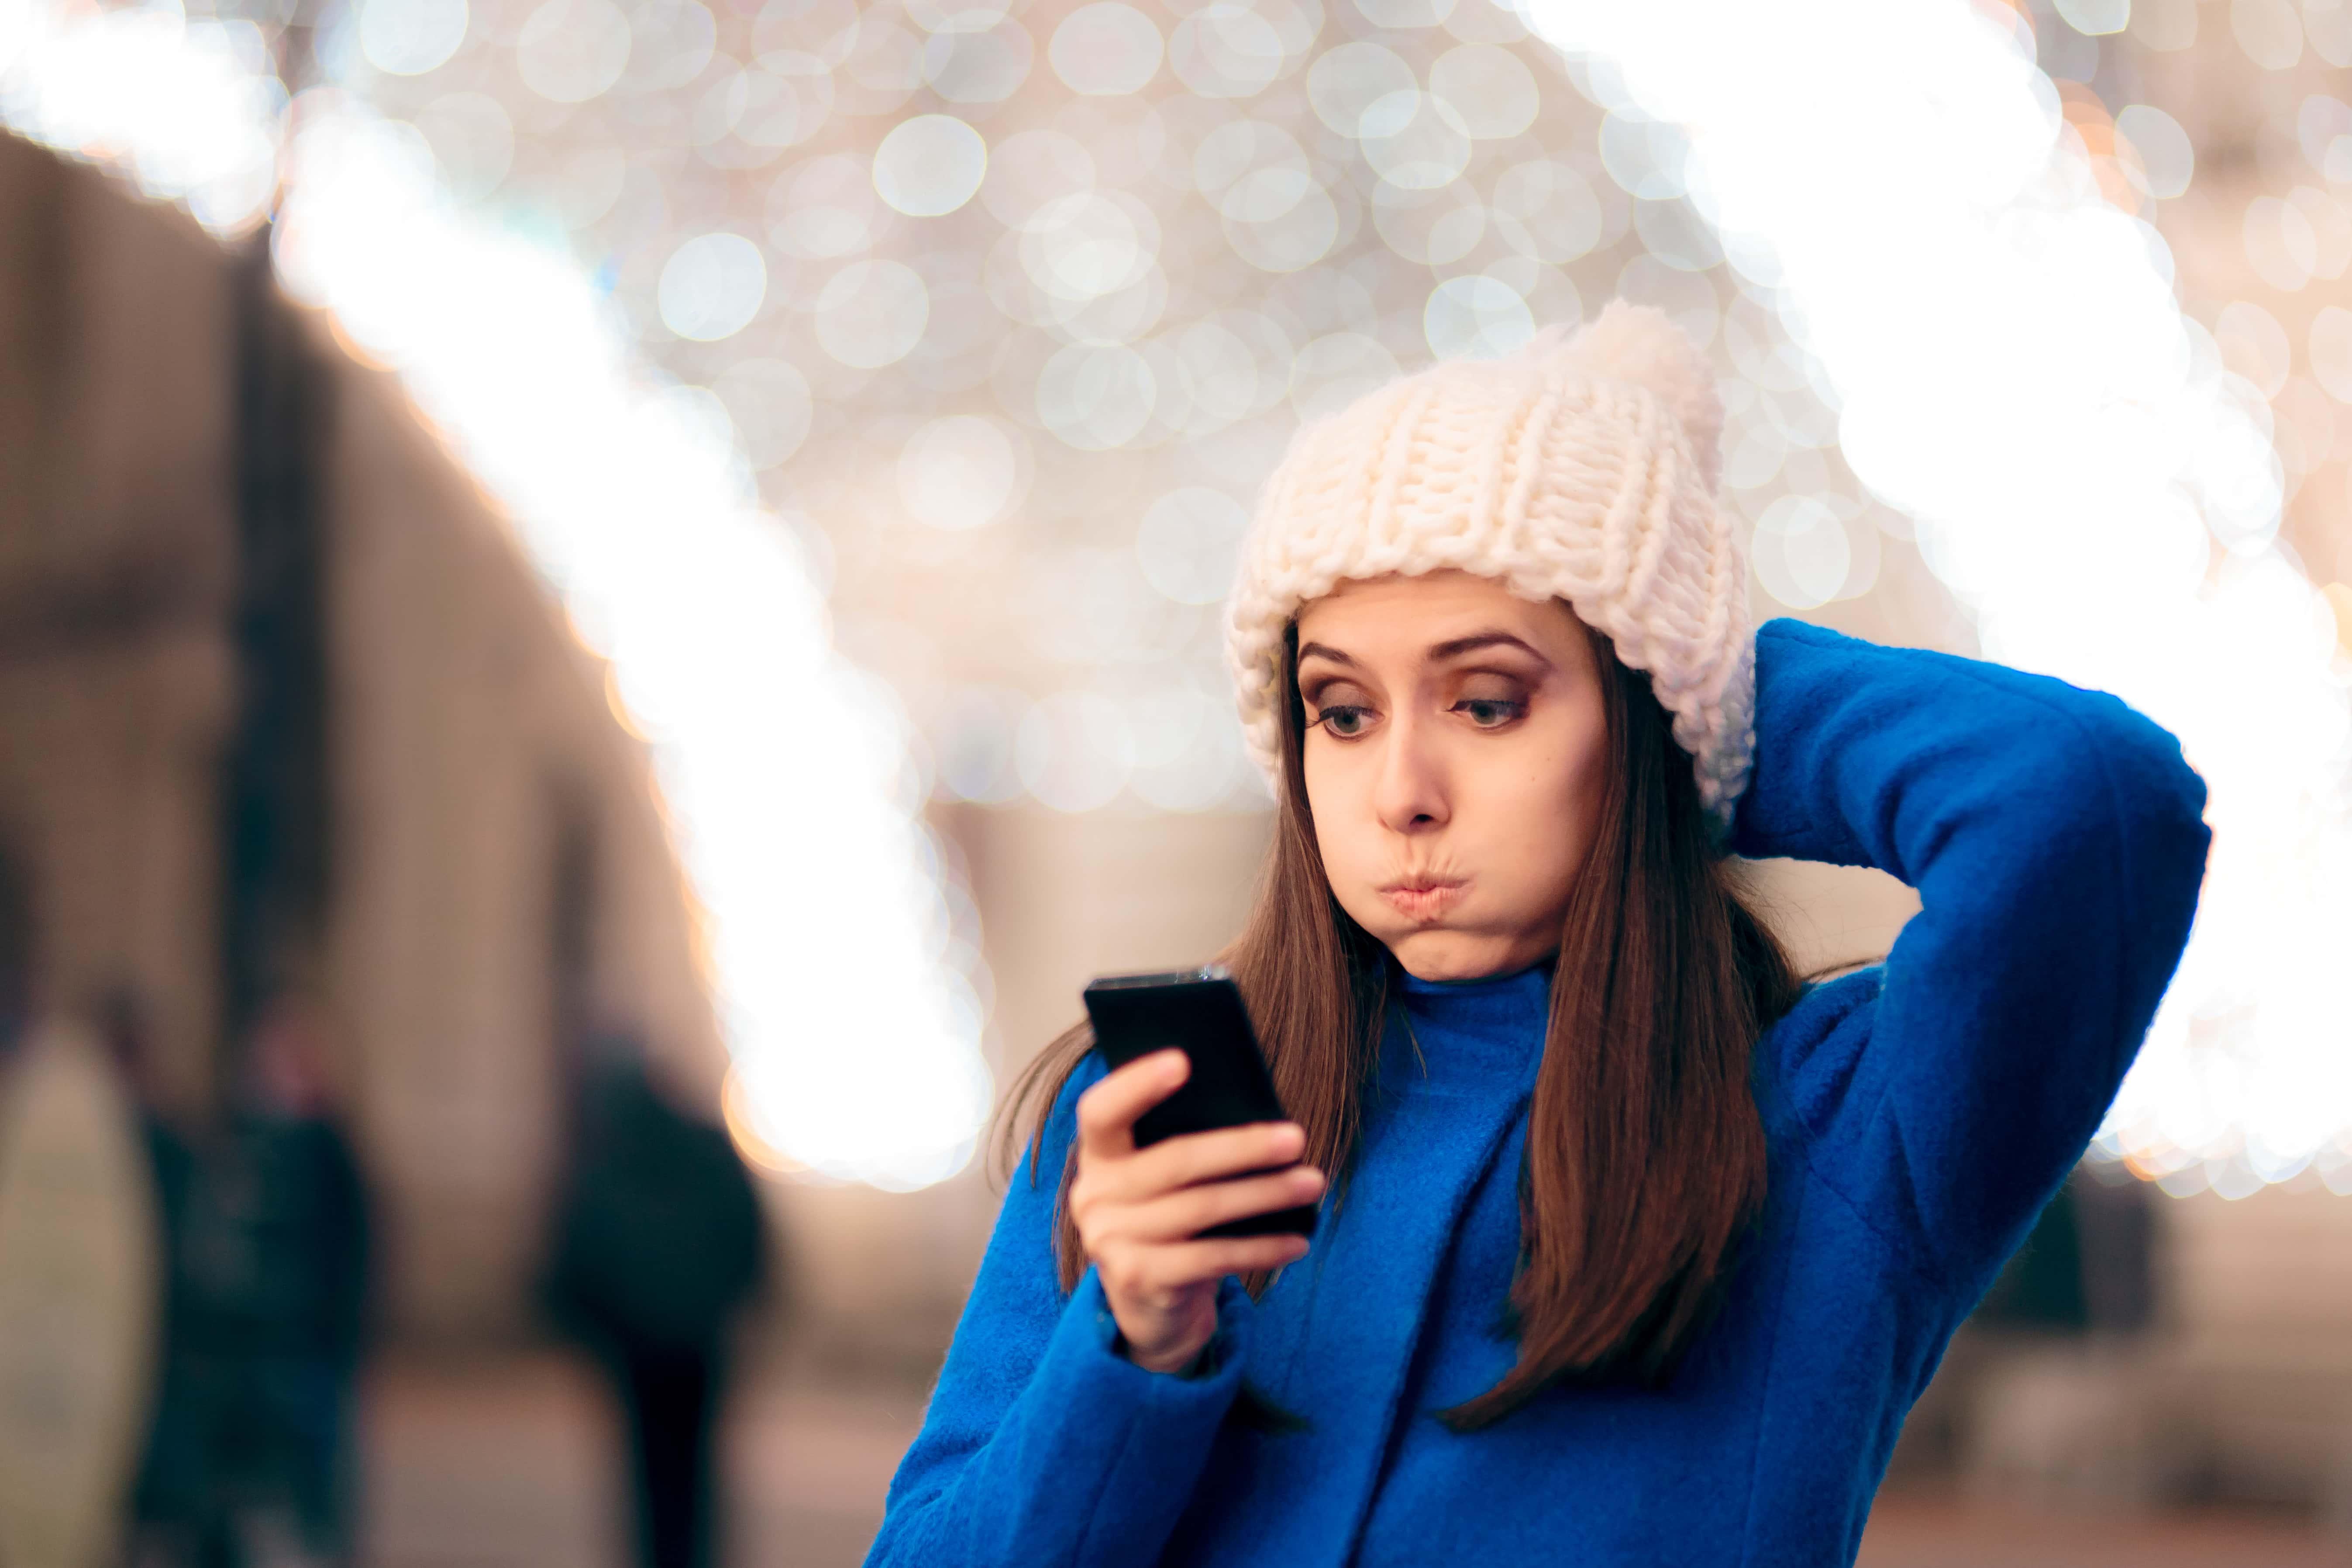 Introverts Avoid Human Interaction facts